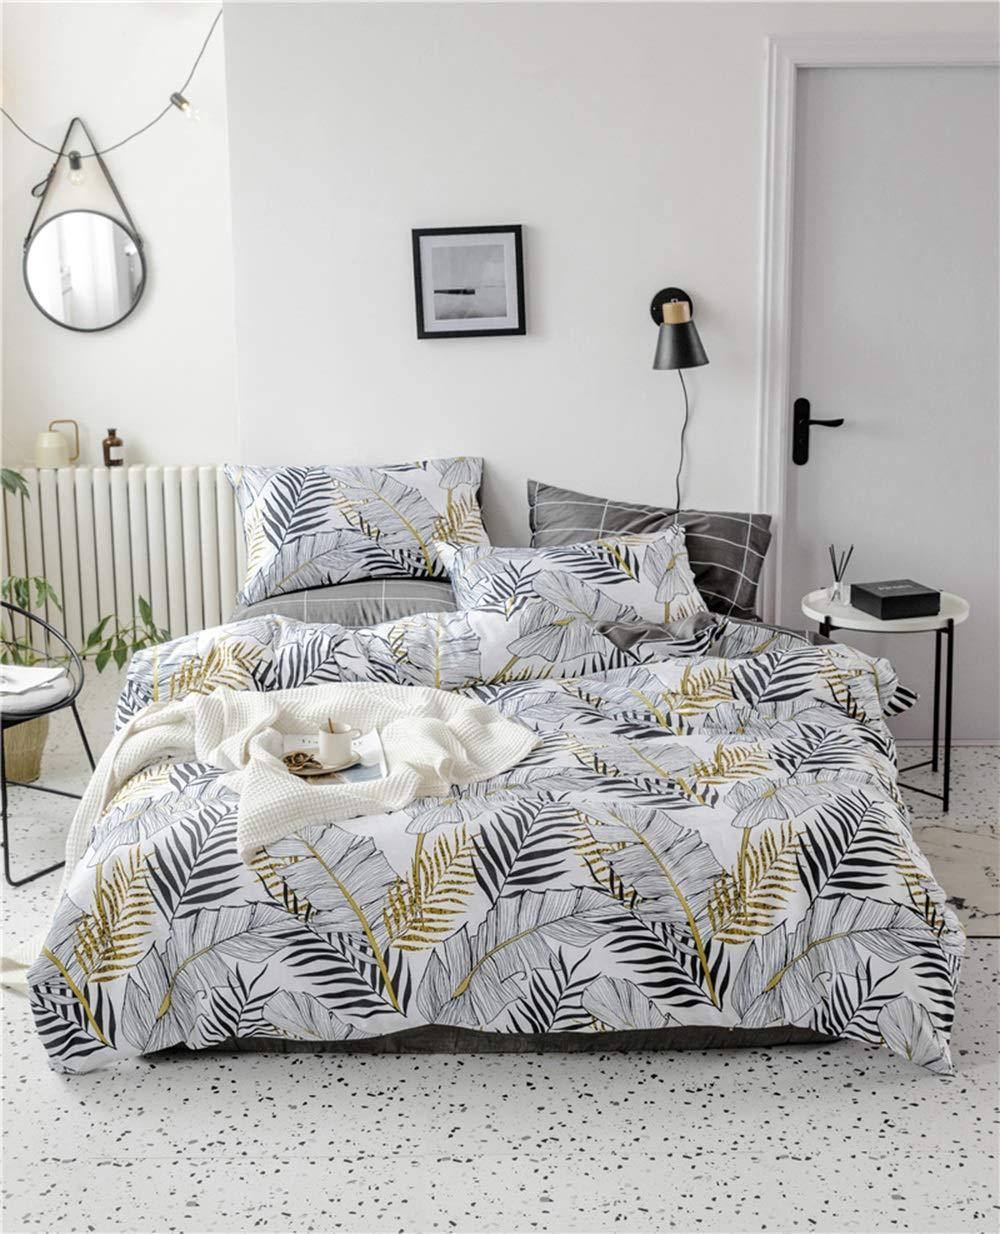 CSYP 新しい綿4ピースコットンシンプルで新鮮な寝具シーツキルトカバー (Color : Brass) B07Q7GZ4DB